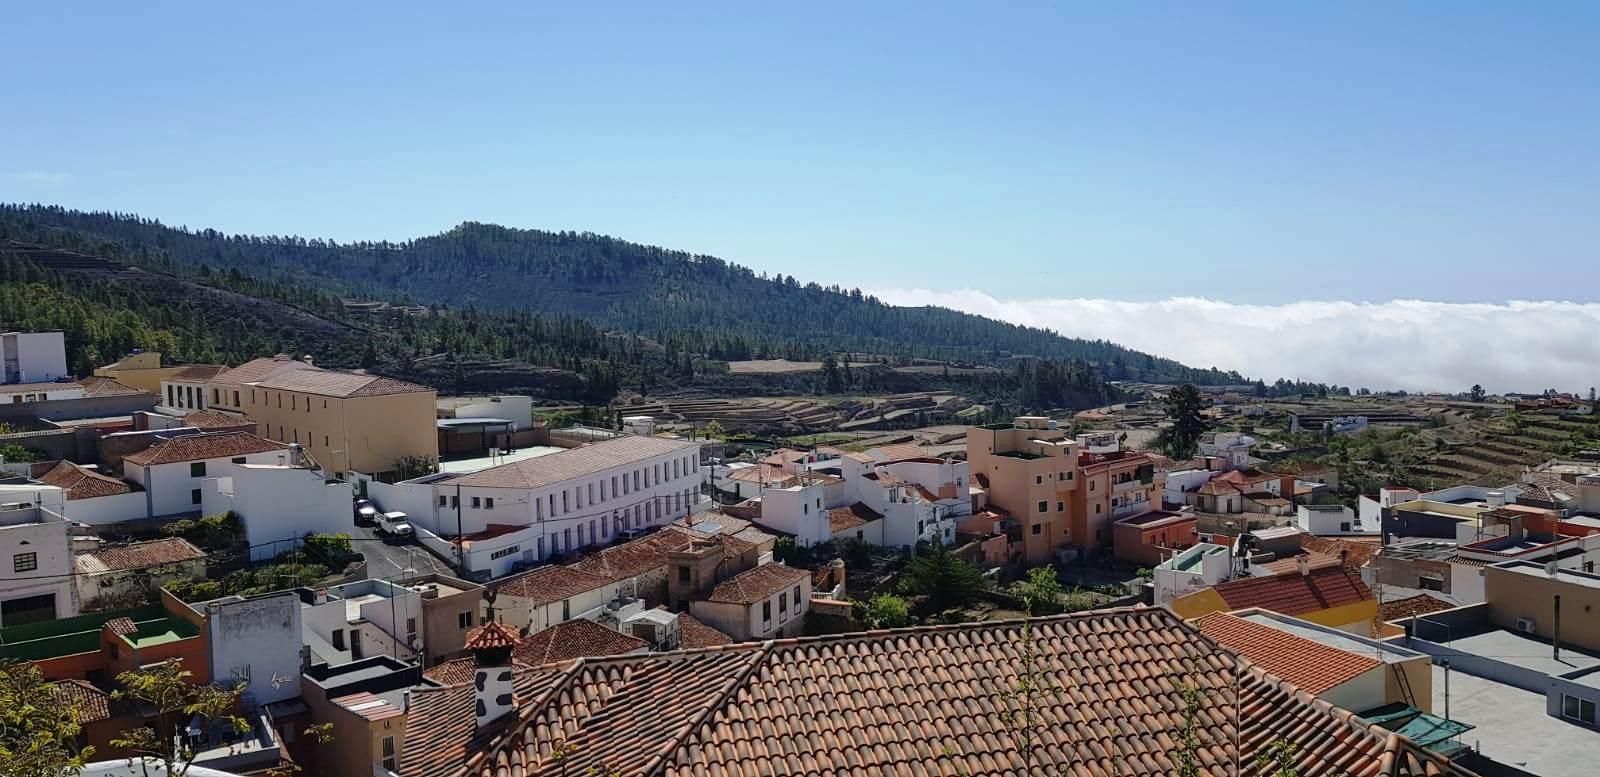 Vilaflor, Santa Cruz de Tenerife - vacantele turistilor - ANCAPAVEL.RO